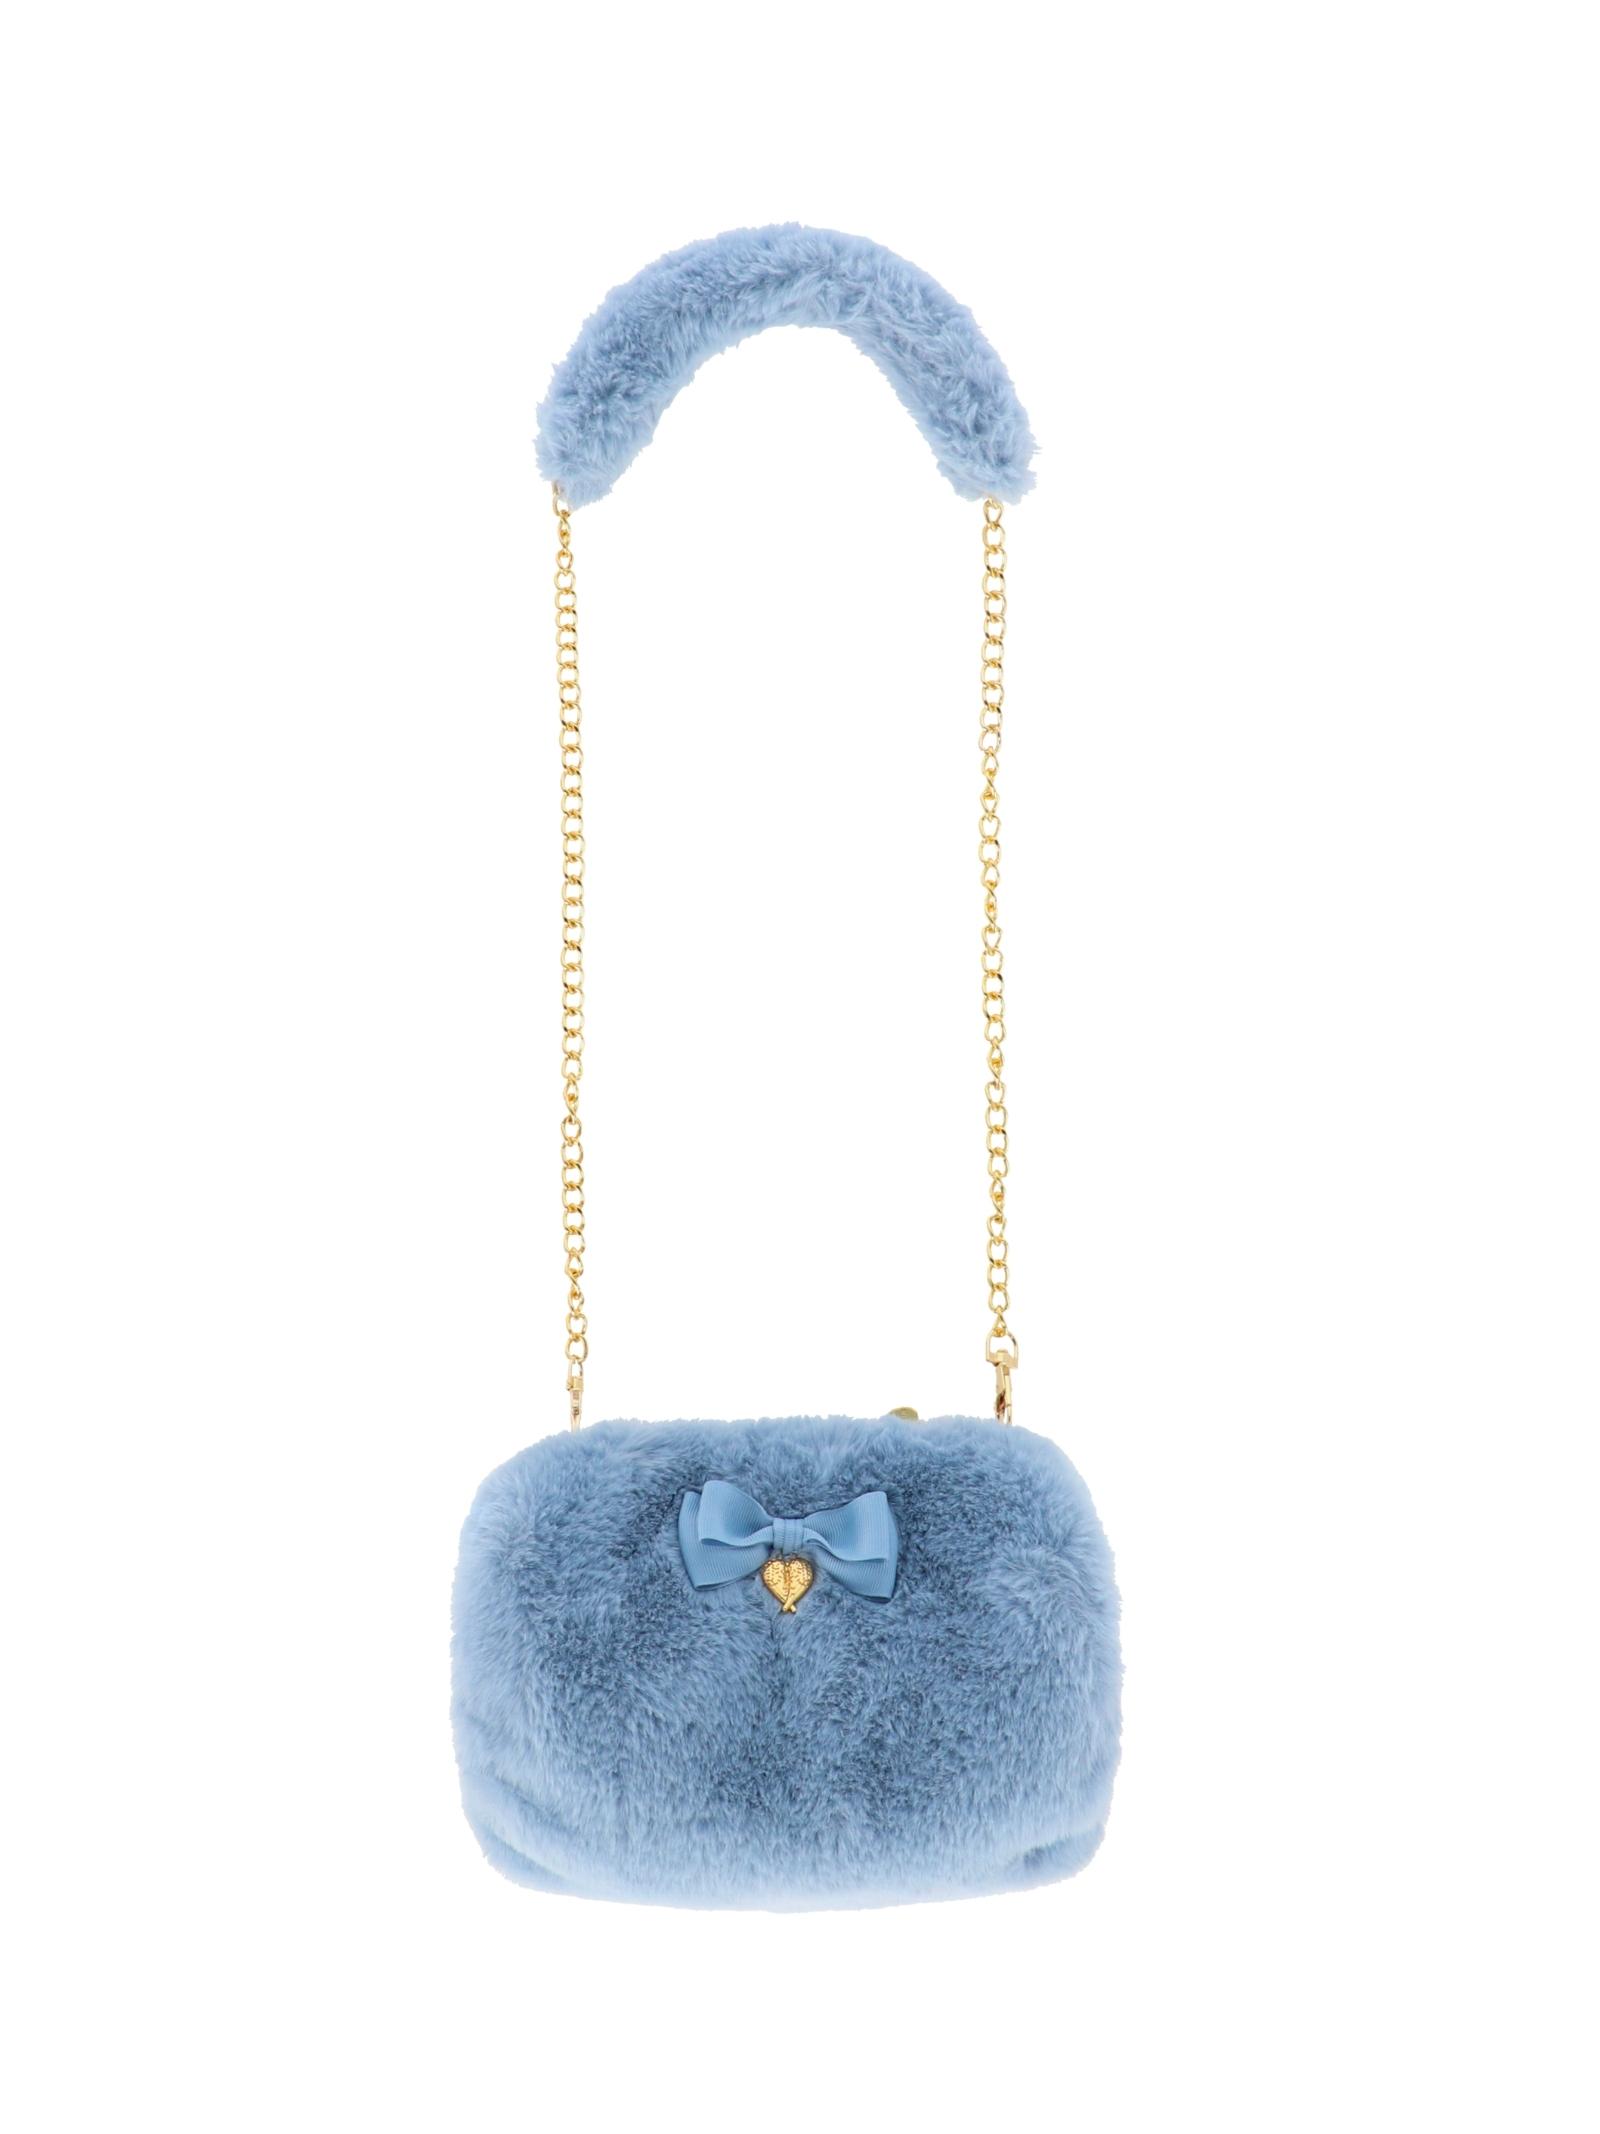 Mandy Misty Blue Girl Bag ANGEL'S FACE | bags | MANDYMISTY BLUE